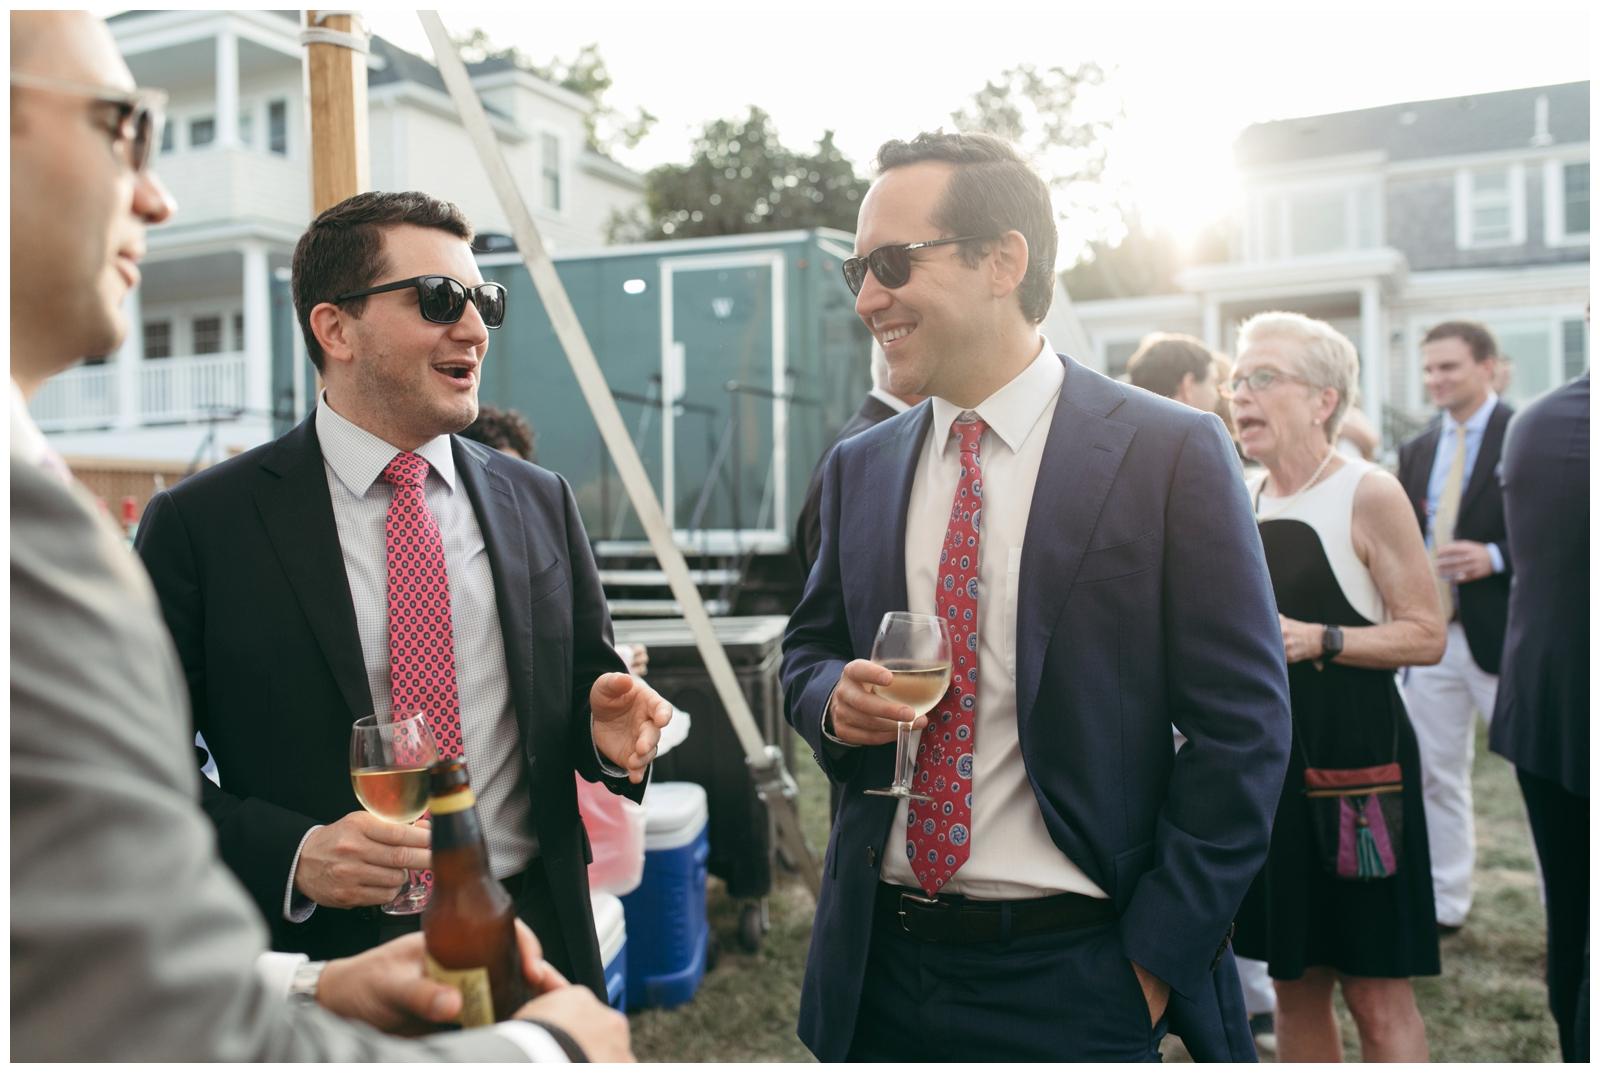 Bailey-Q-Photo-Backyard-Wedding-South-Shore-Boston-Wedding-Photographer-076.jpg